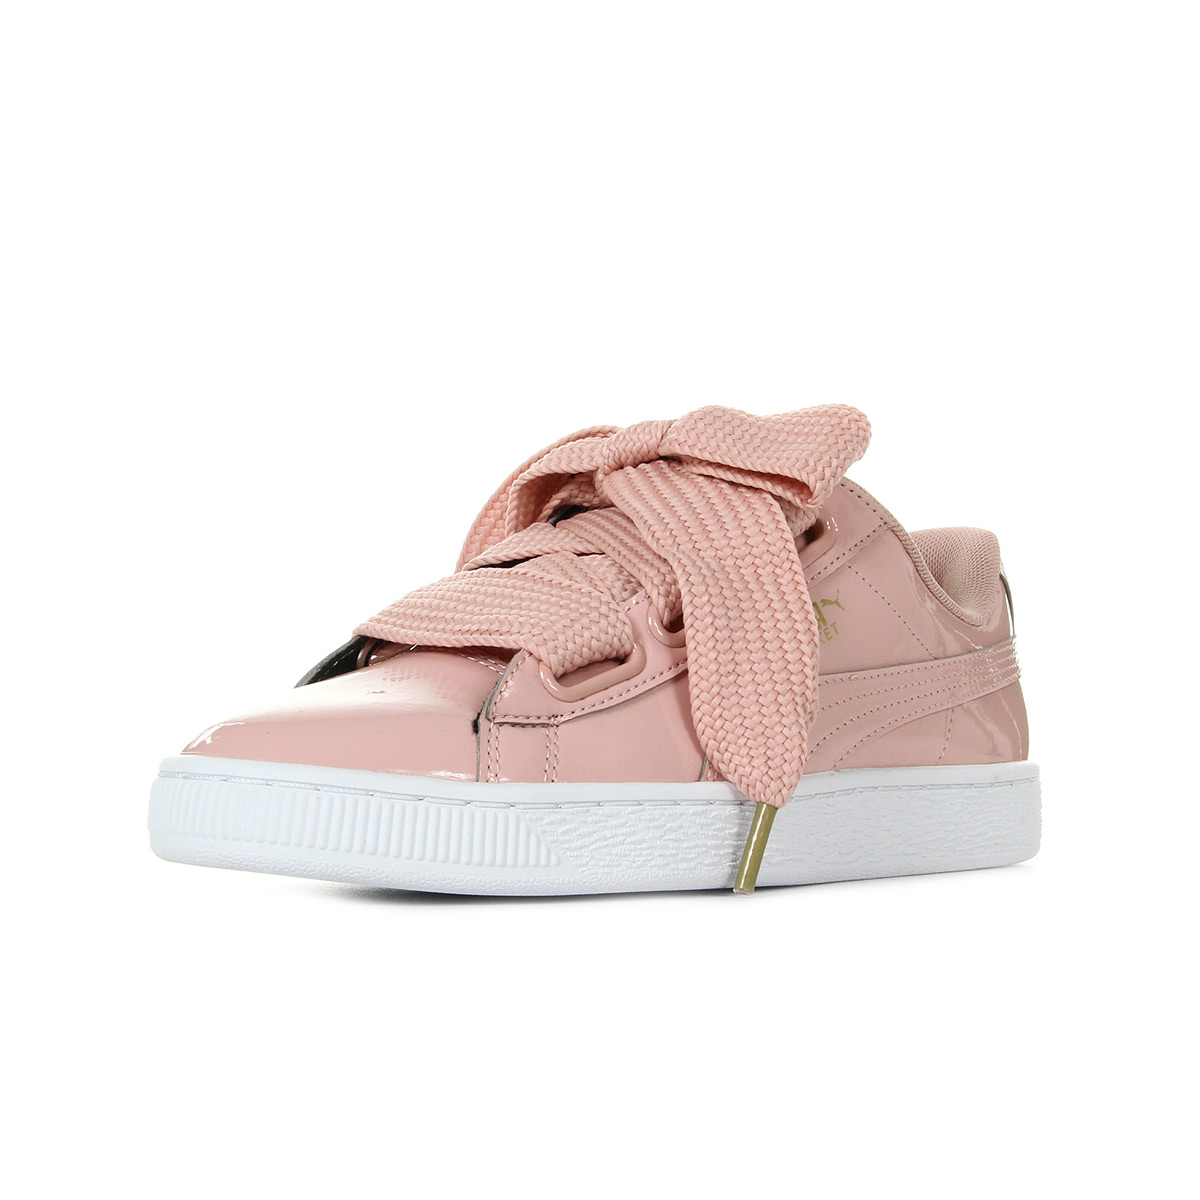 chaussure de course sandale Coquille-orteil engrenerà lacets coquille sport yjLlP2EsHP